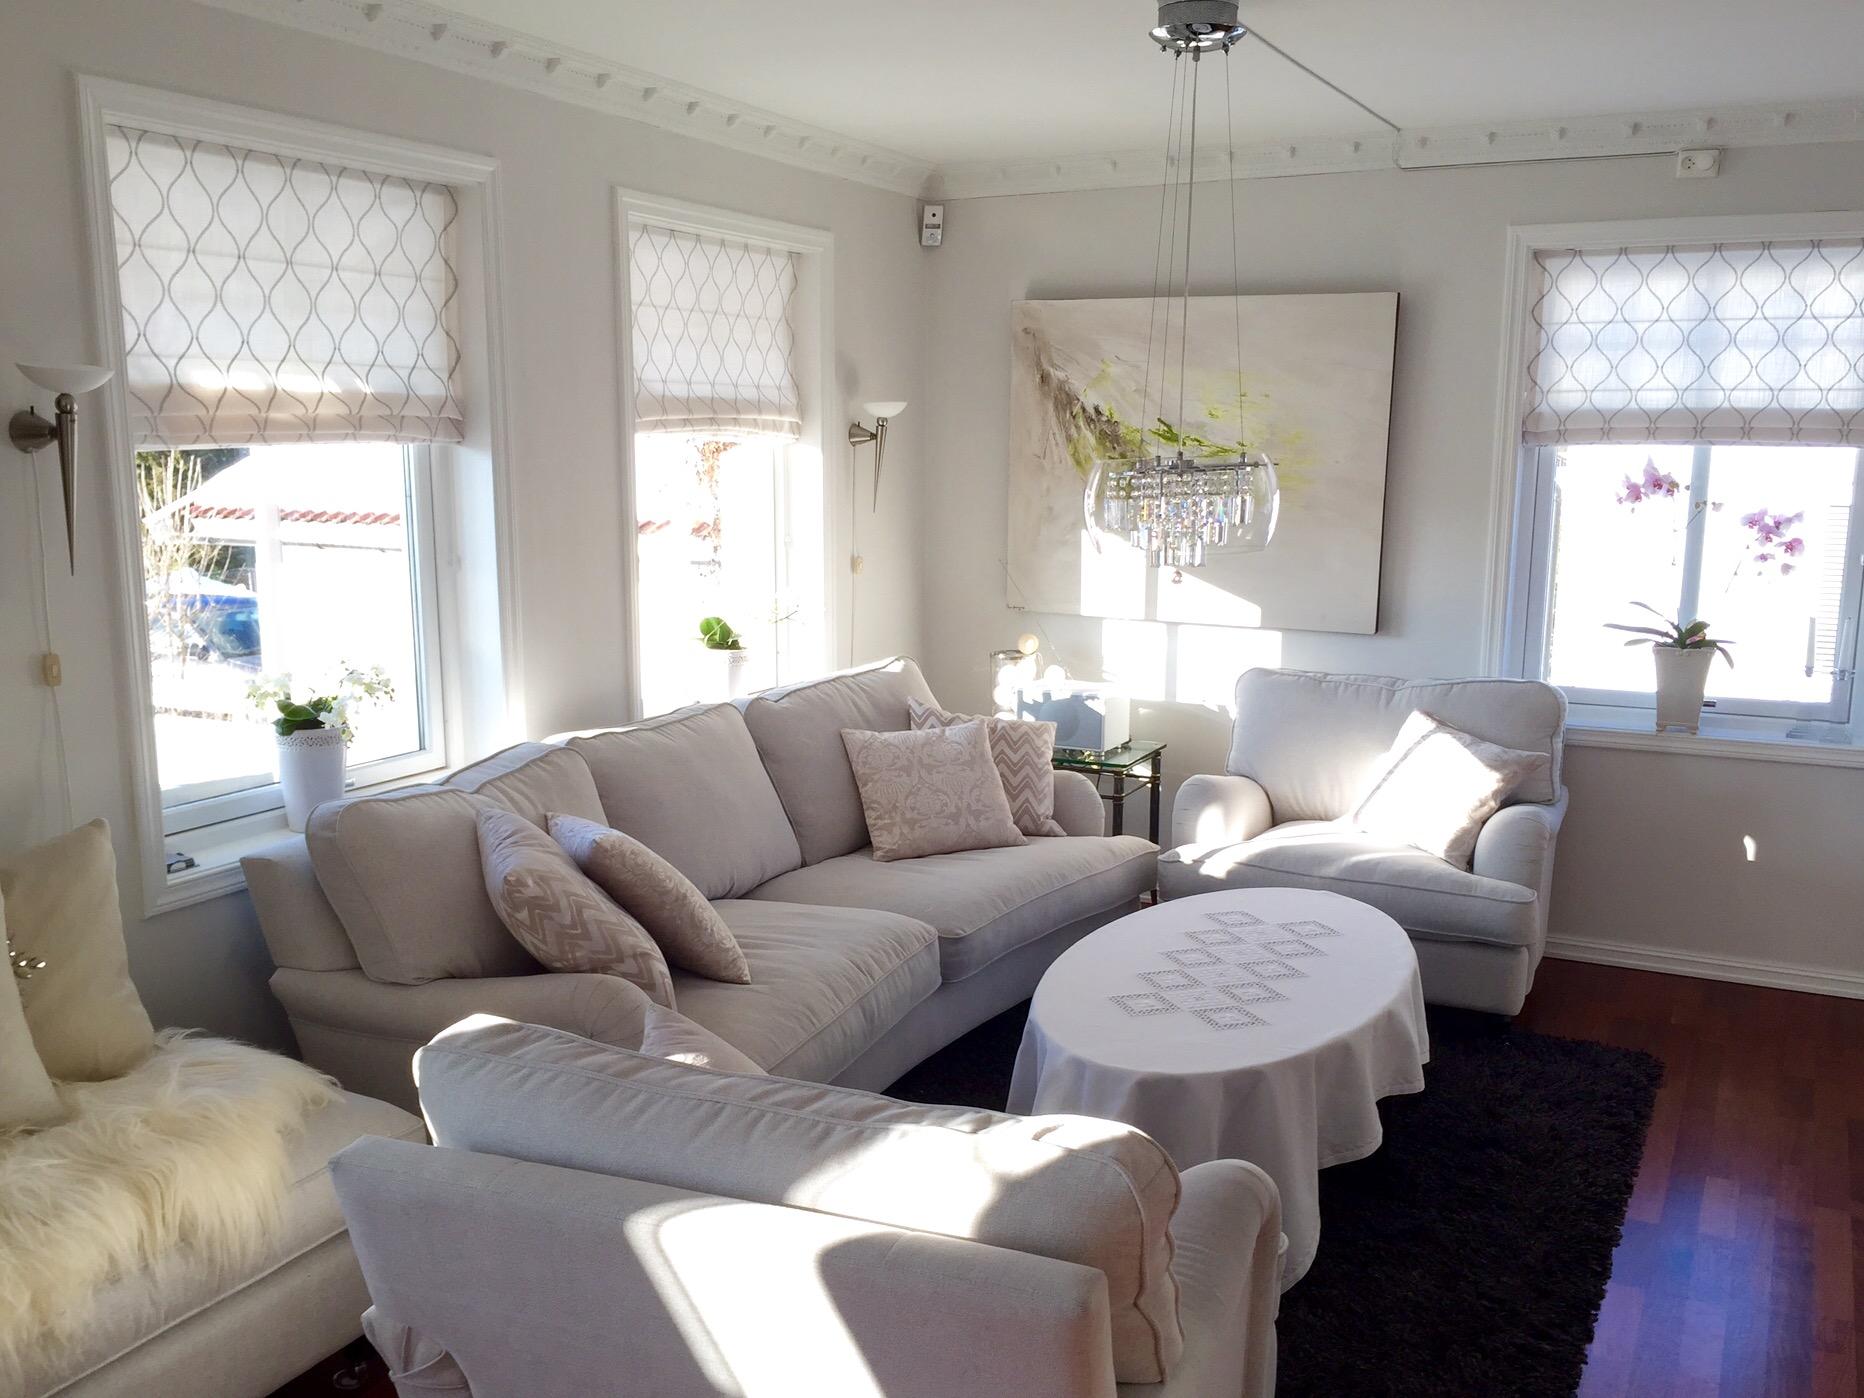 Liftgardiner stue – Materialvalg for baderomsmøbler